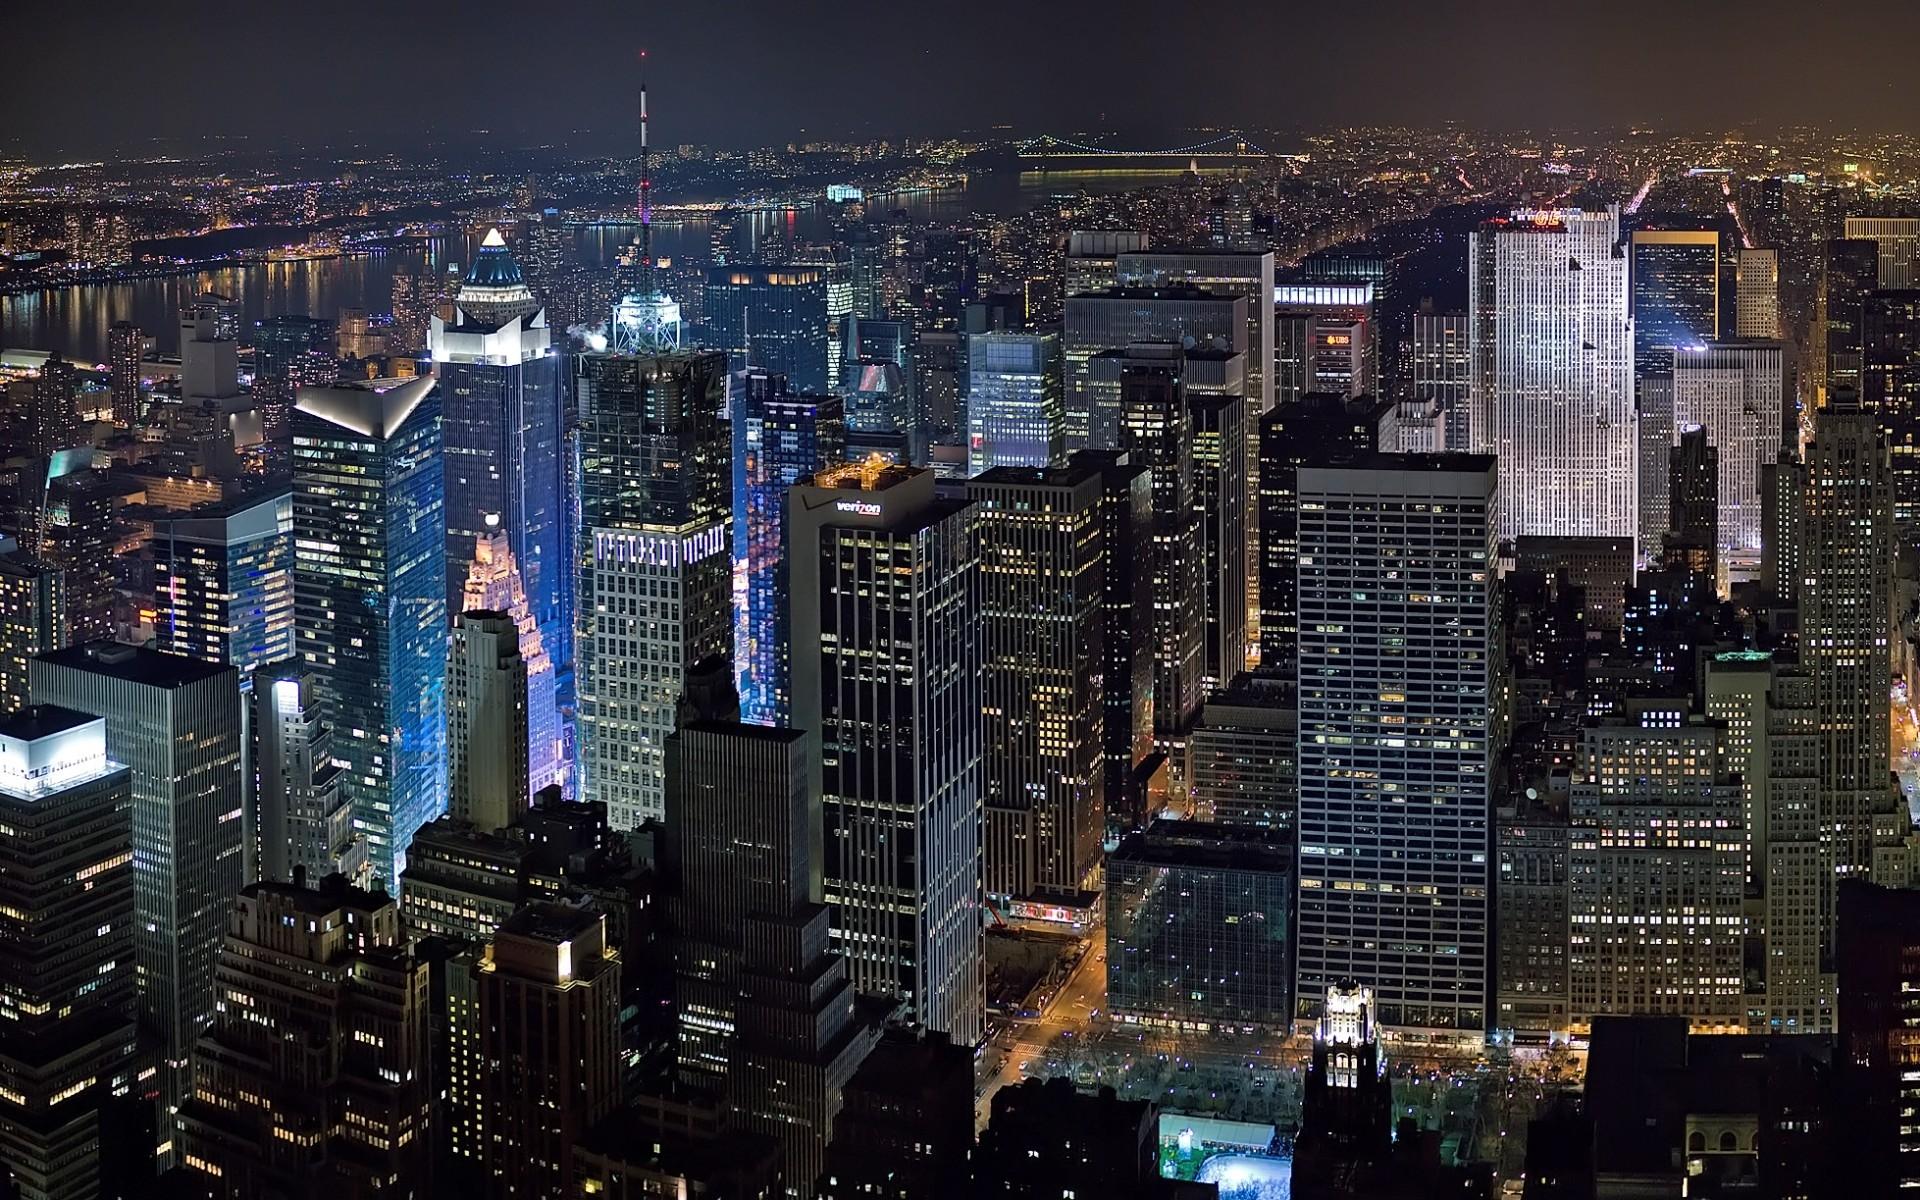 New York City At Night Wallpaper Free Desktop